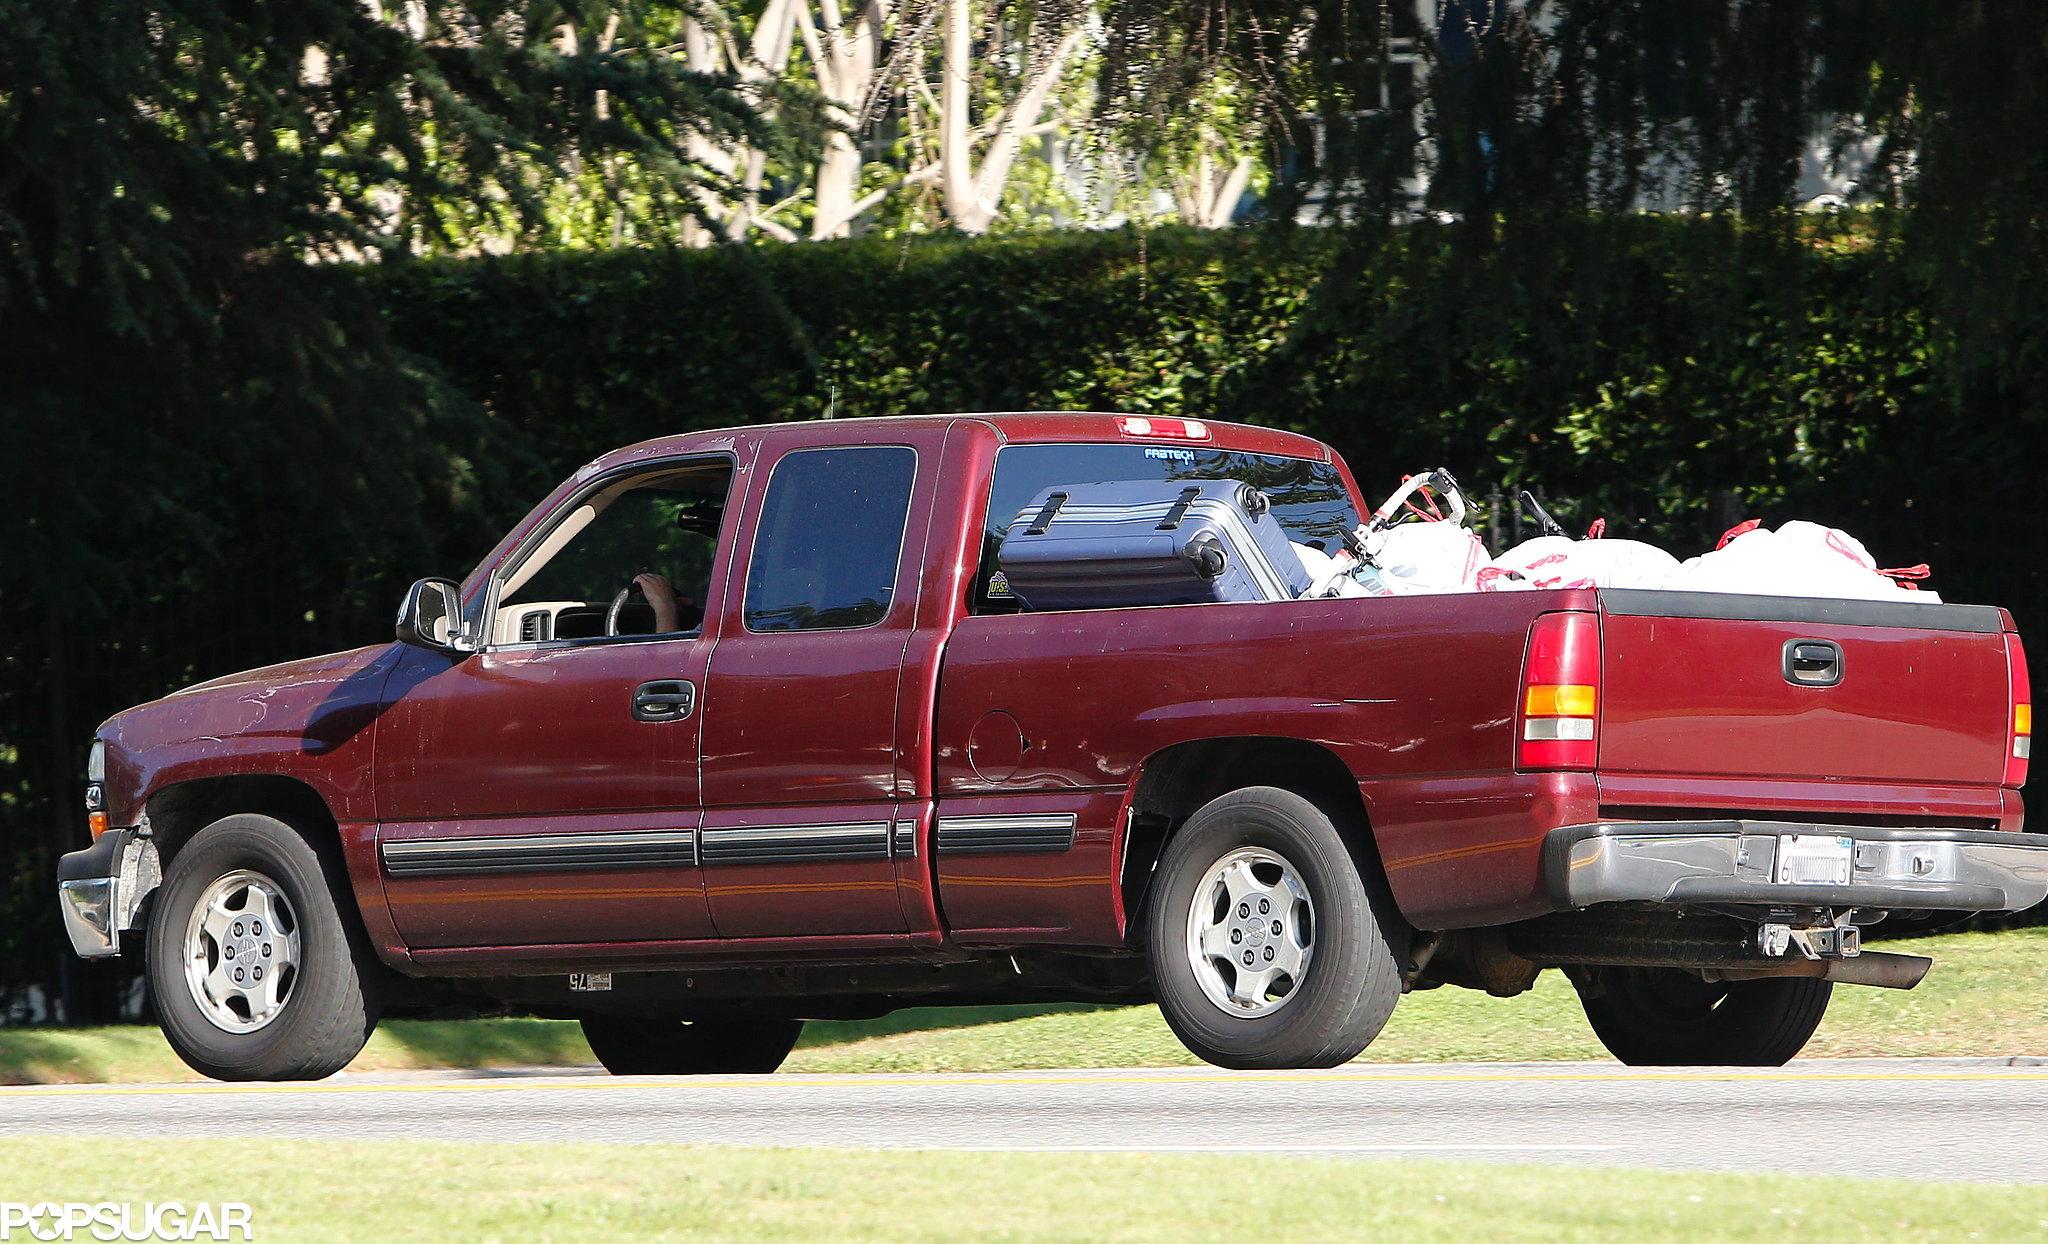 Robert Pattinson's truck was full of trash bags.